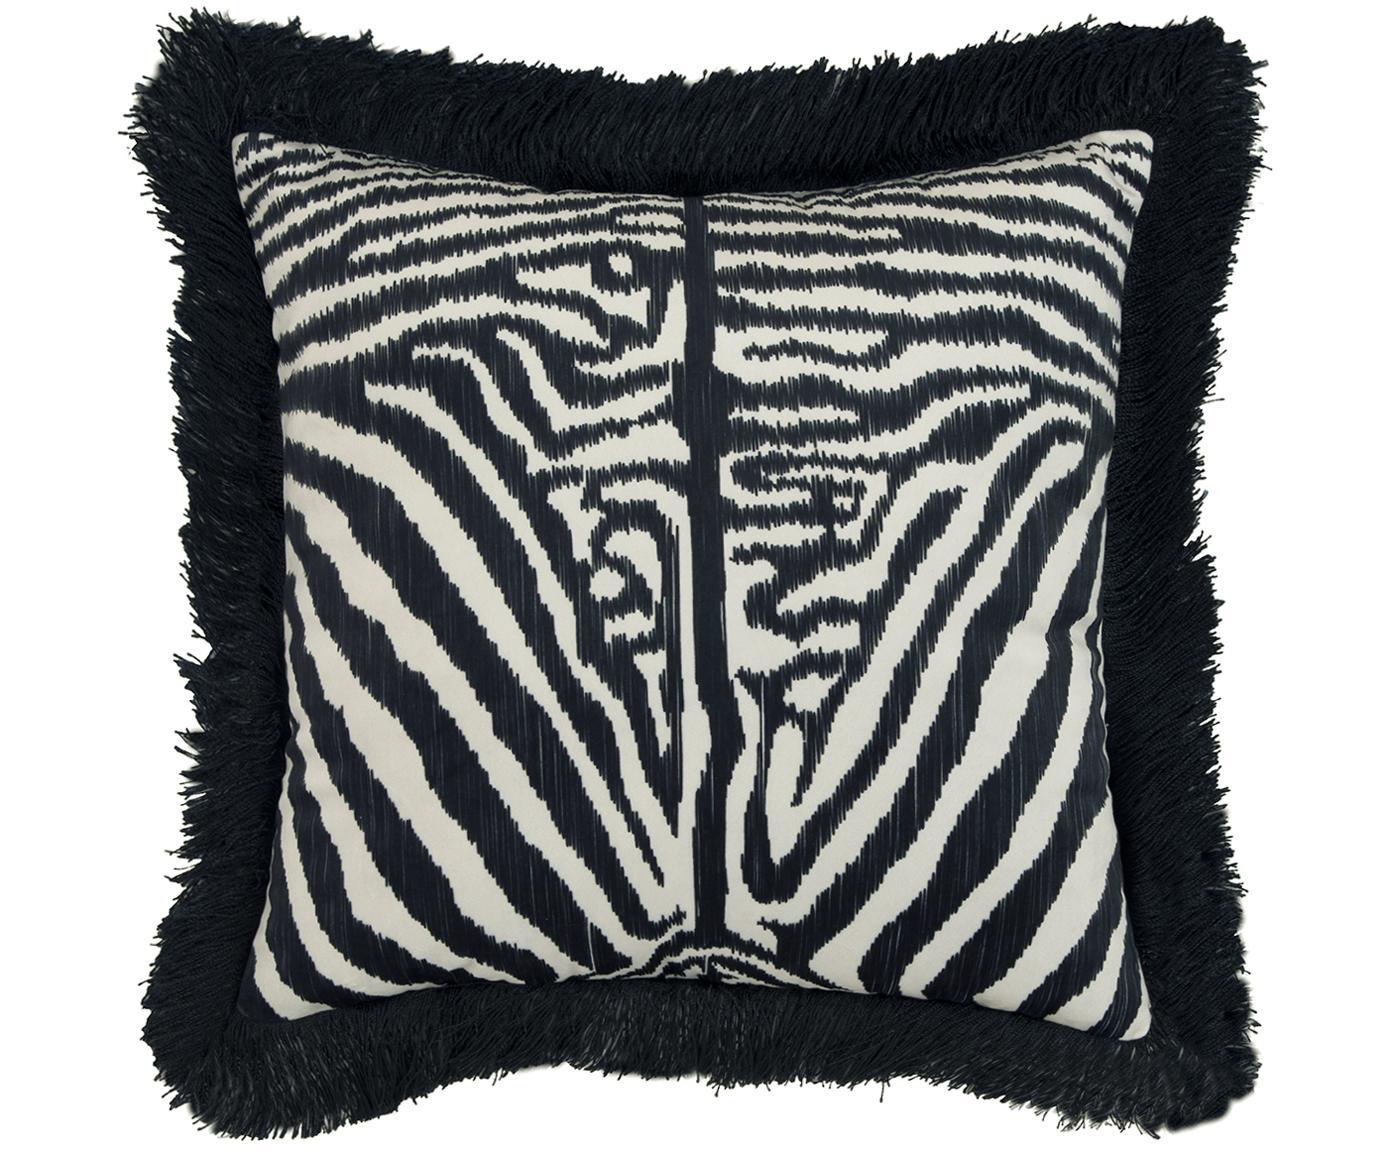 Funda de cojín de terciopelo con flecos Pheneas, Parte delantera: terciopelo de poliéster, Parte trasera: algodón, Flecos: viscosa, Negro, blanco crema, An 40 x L 40 cm